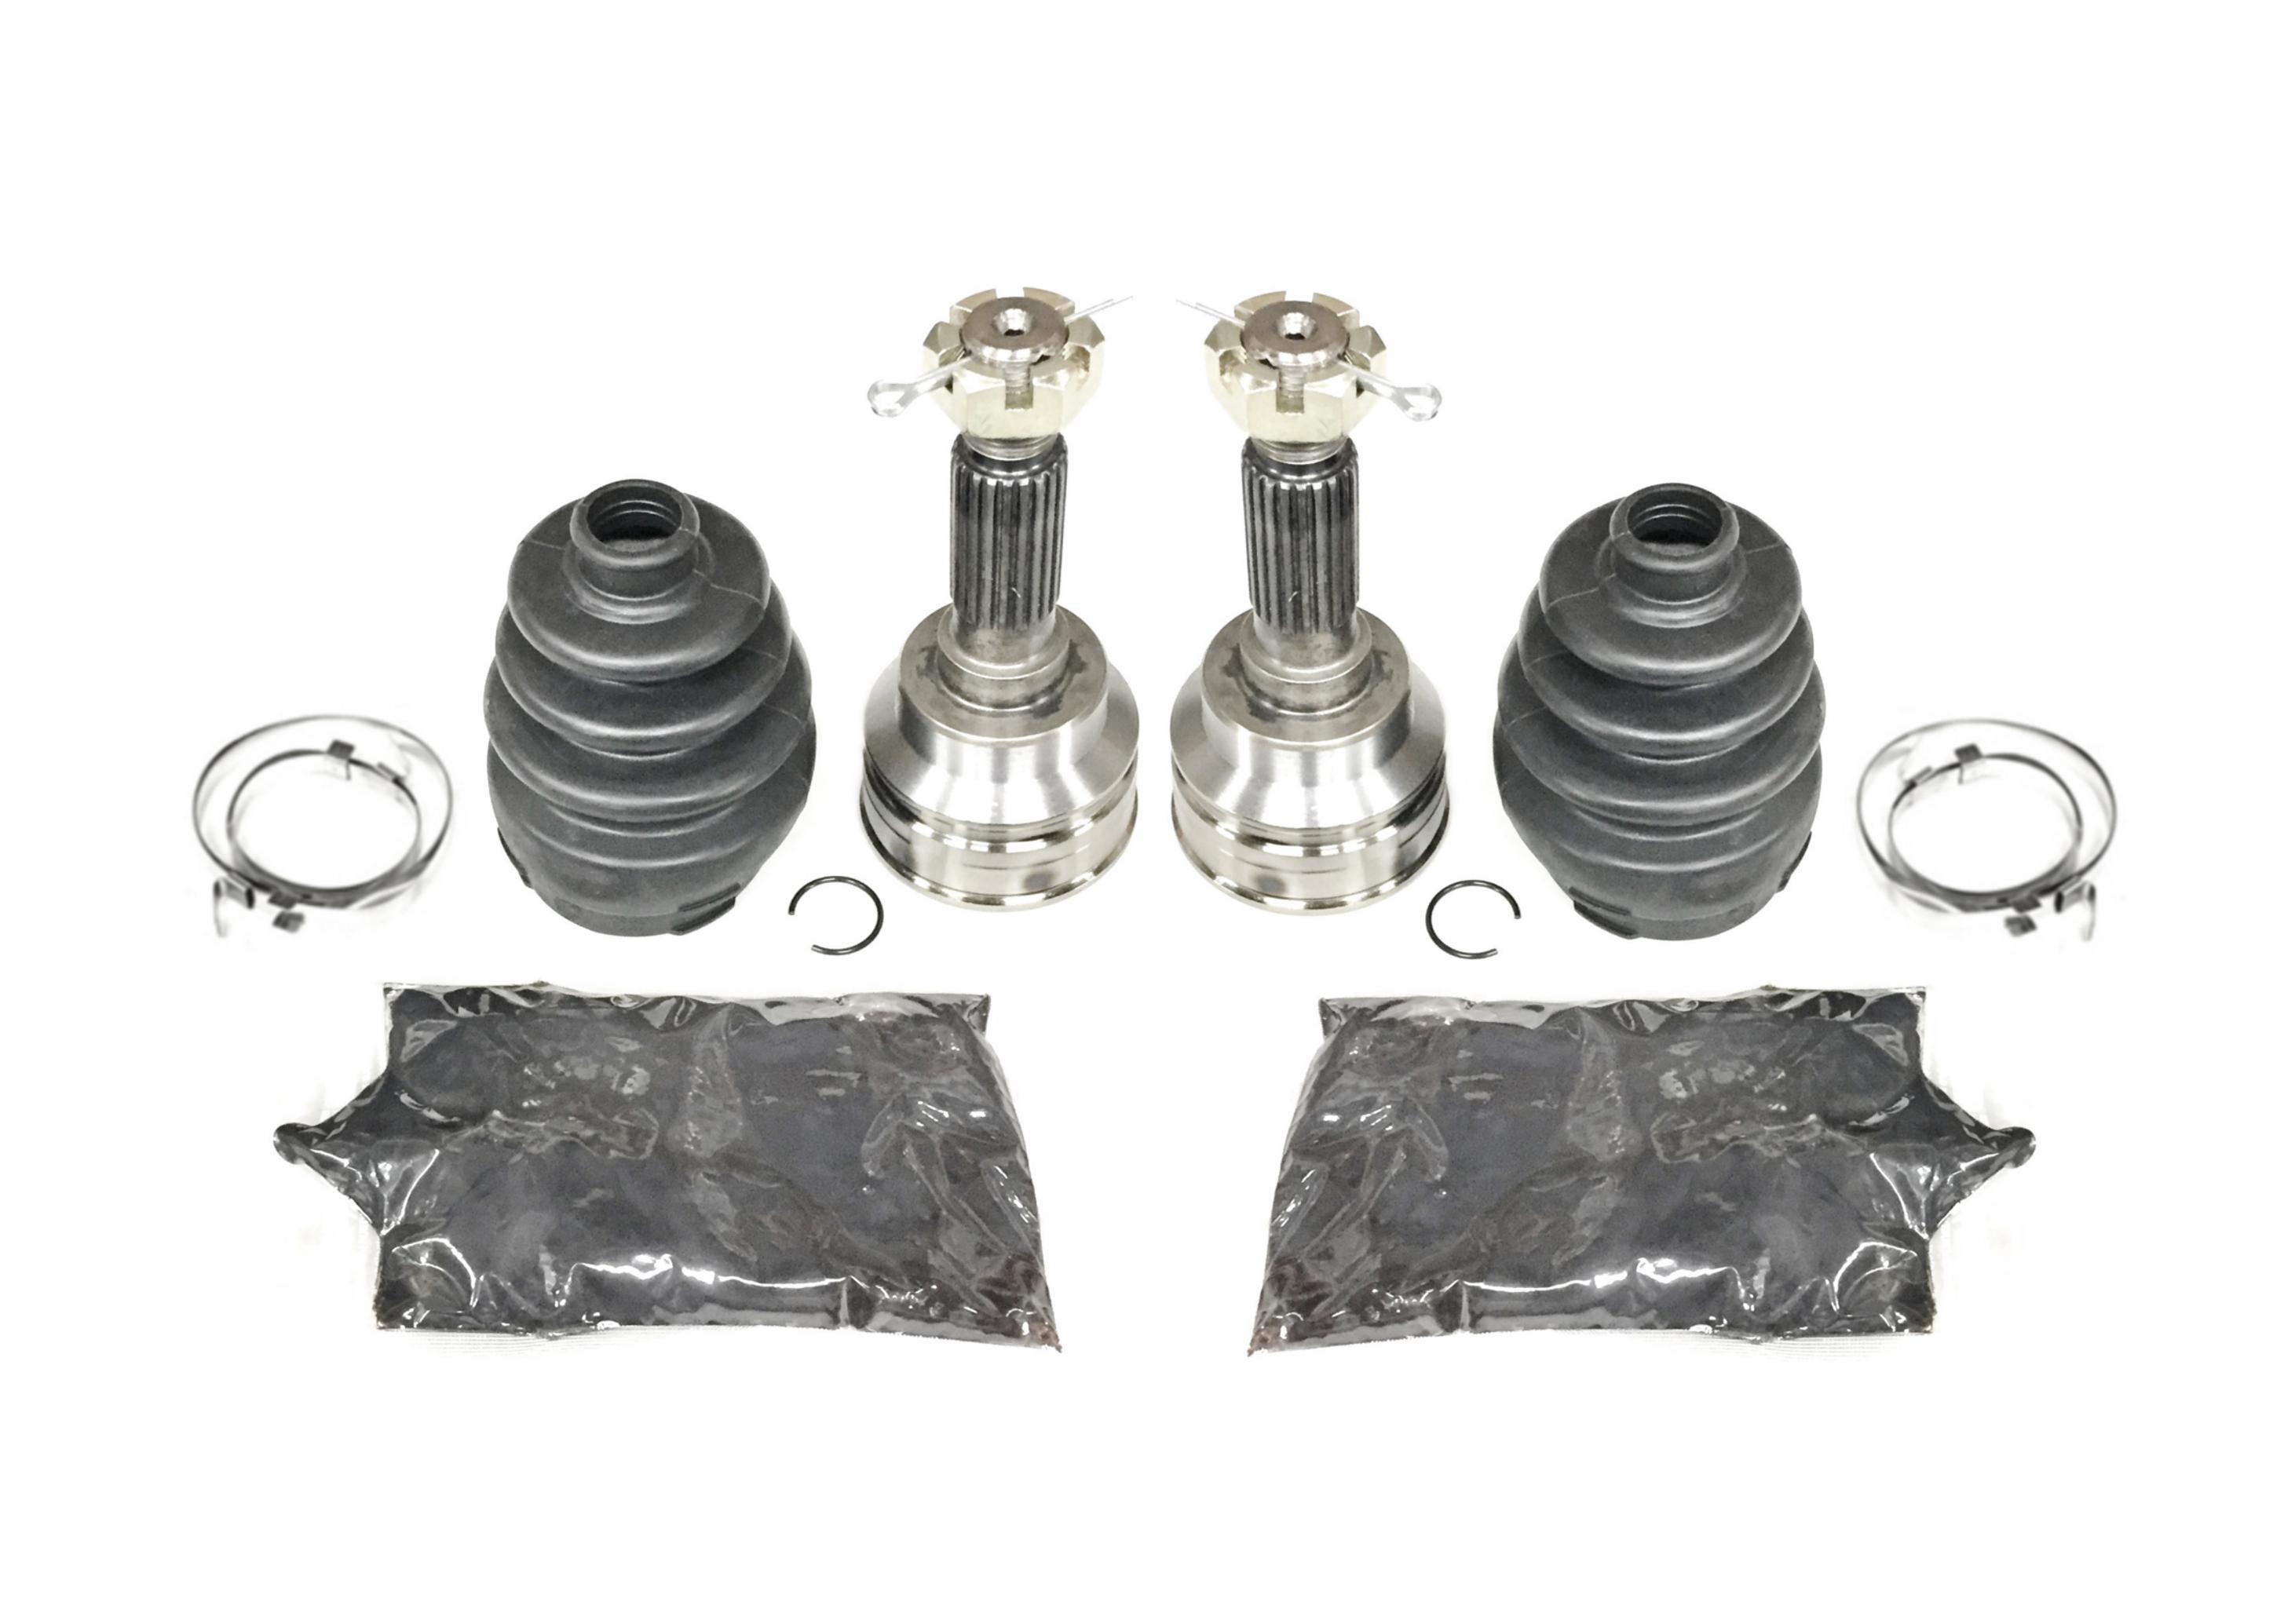 Pair of Rear Axle Inner CV Joint Kits 2007-2010 Yamaha Grizzly 450 4x4 ATV